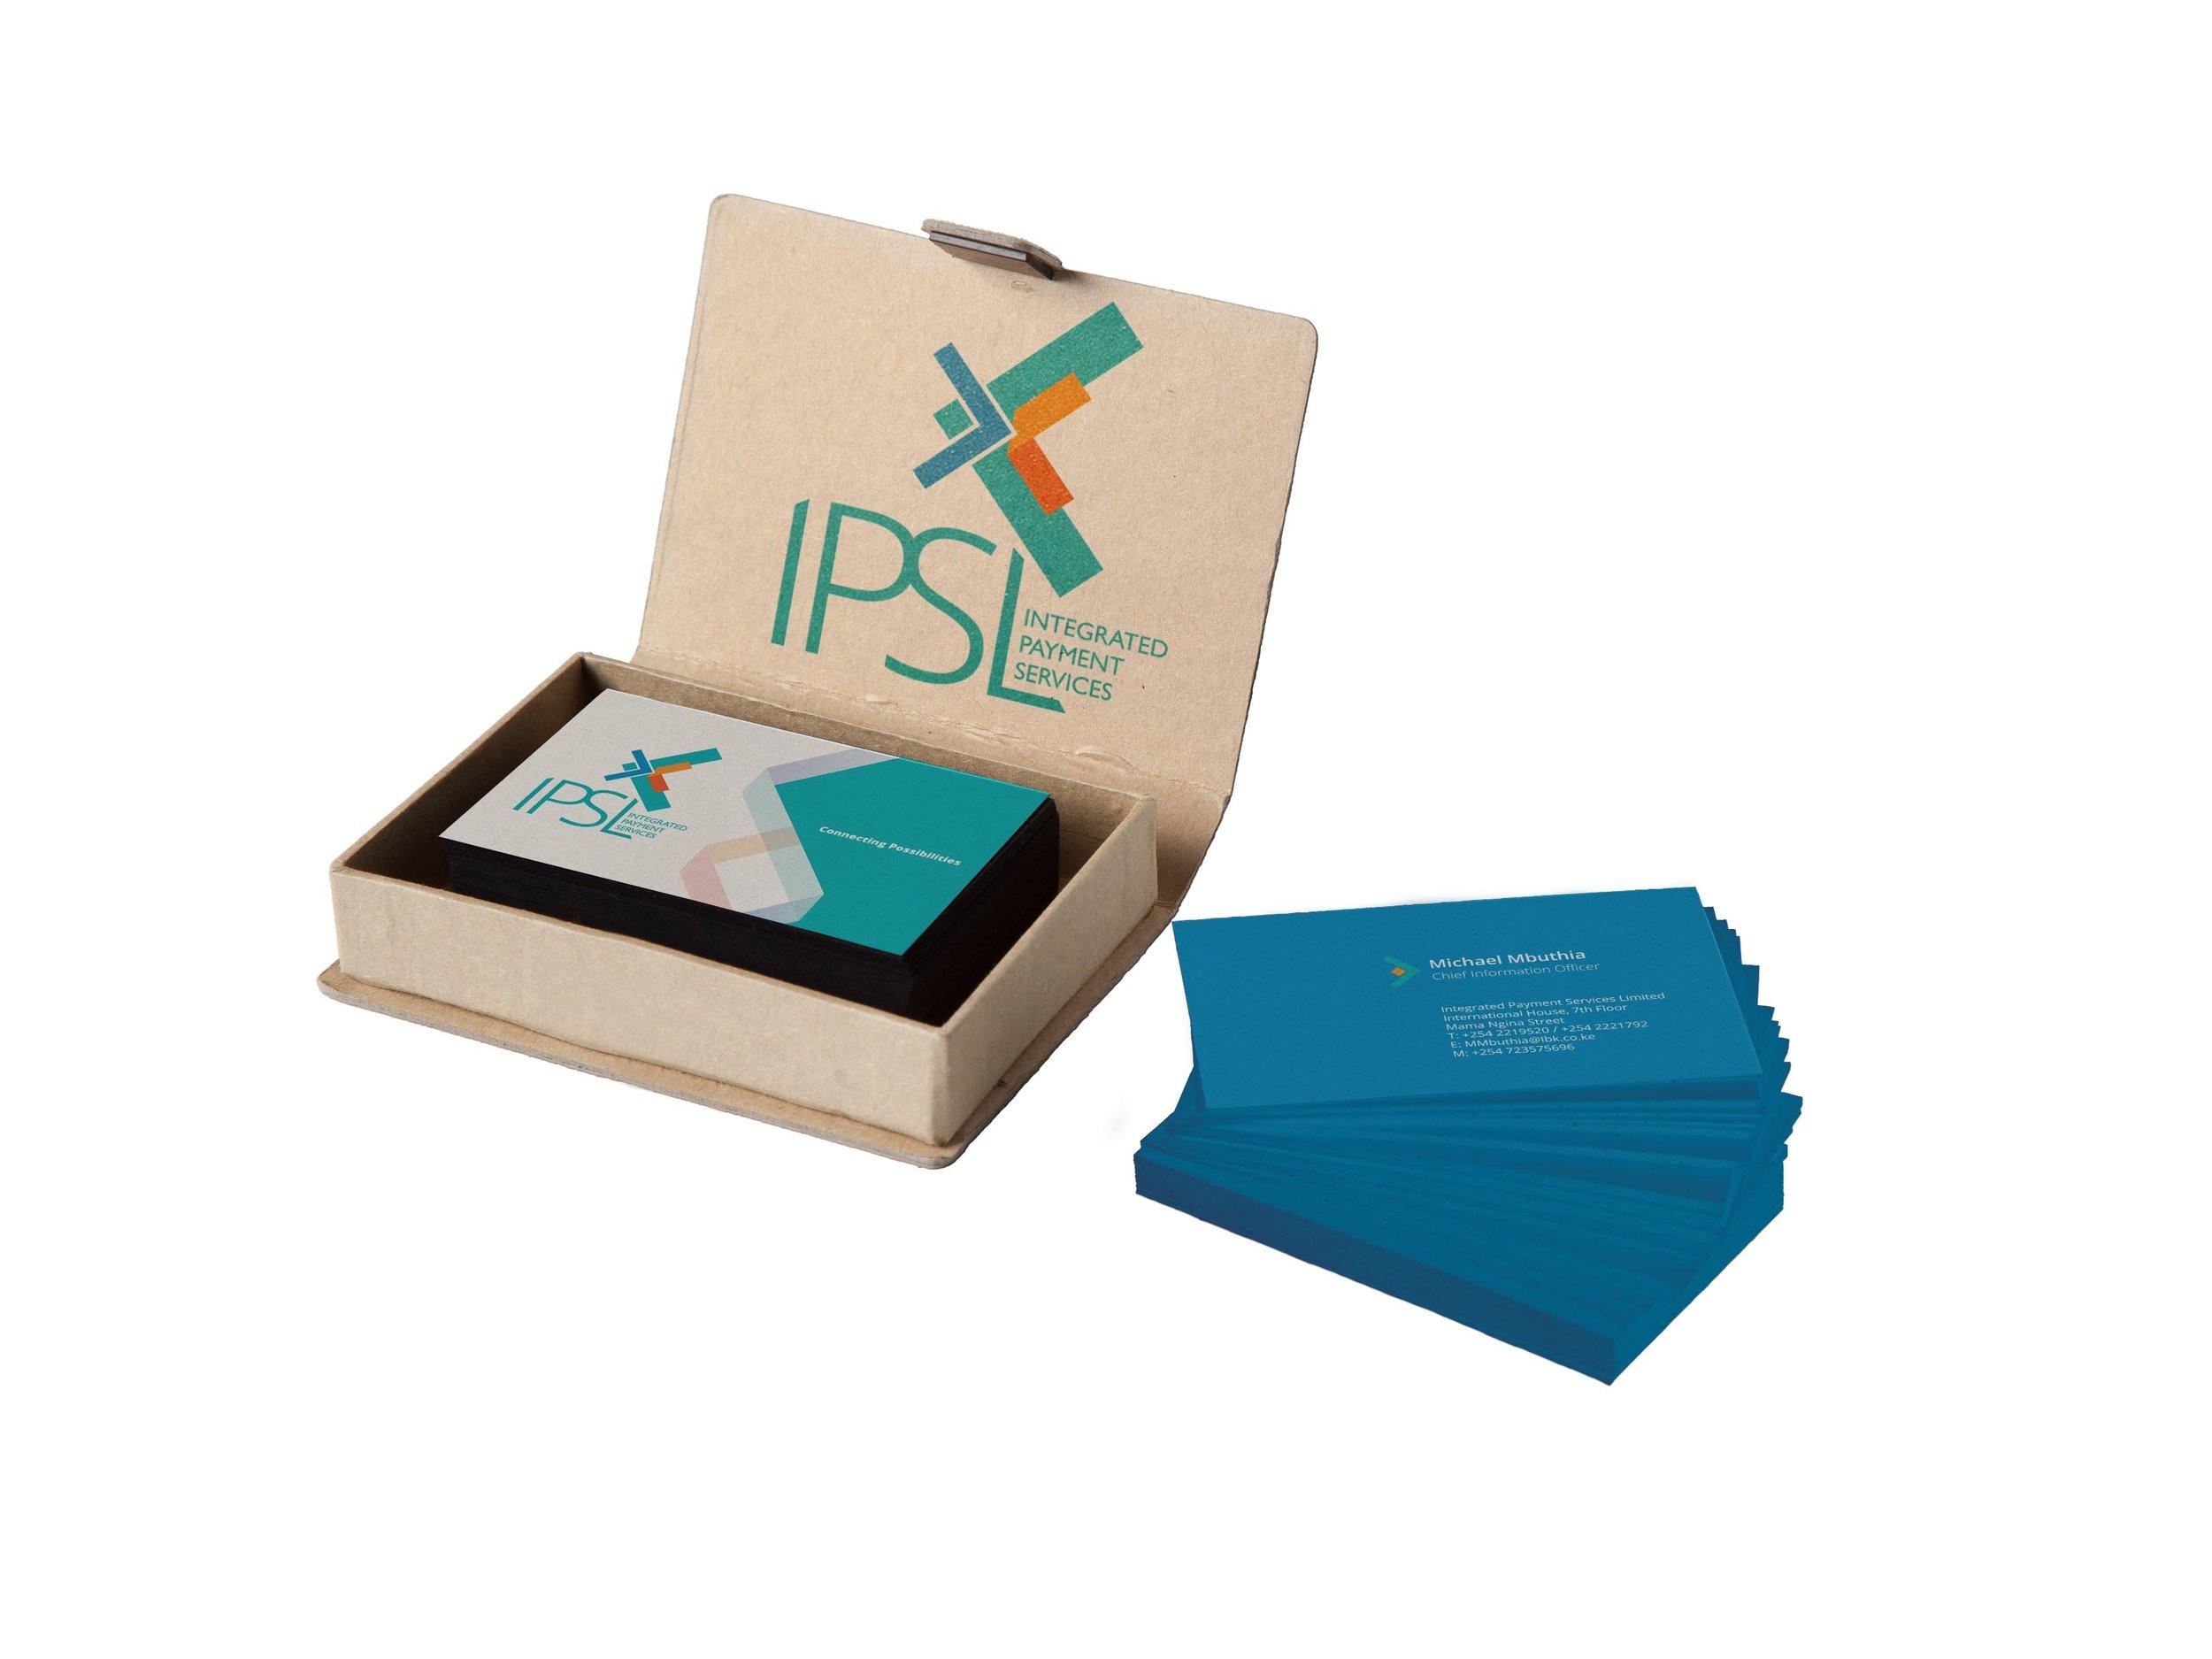 Business-Card-Mock-Up-vol-18.jpg